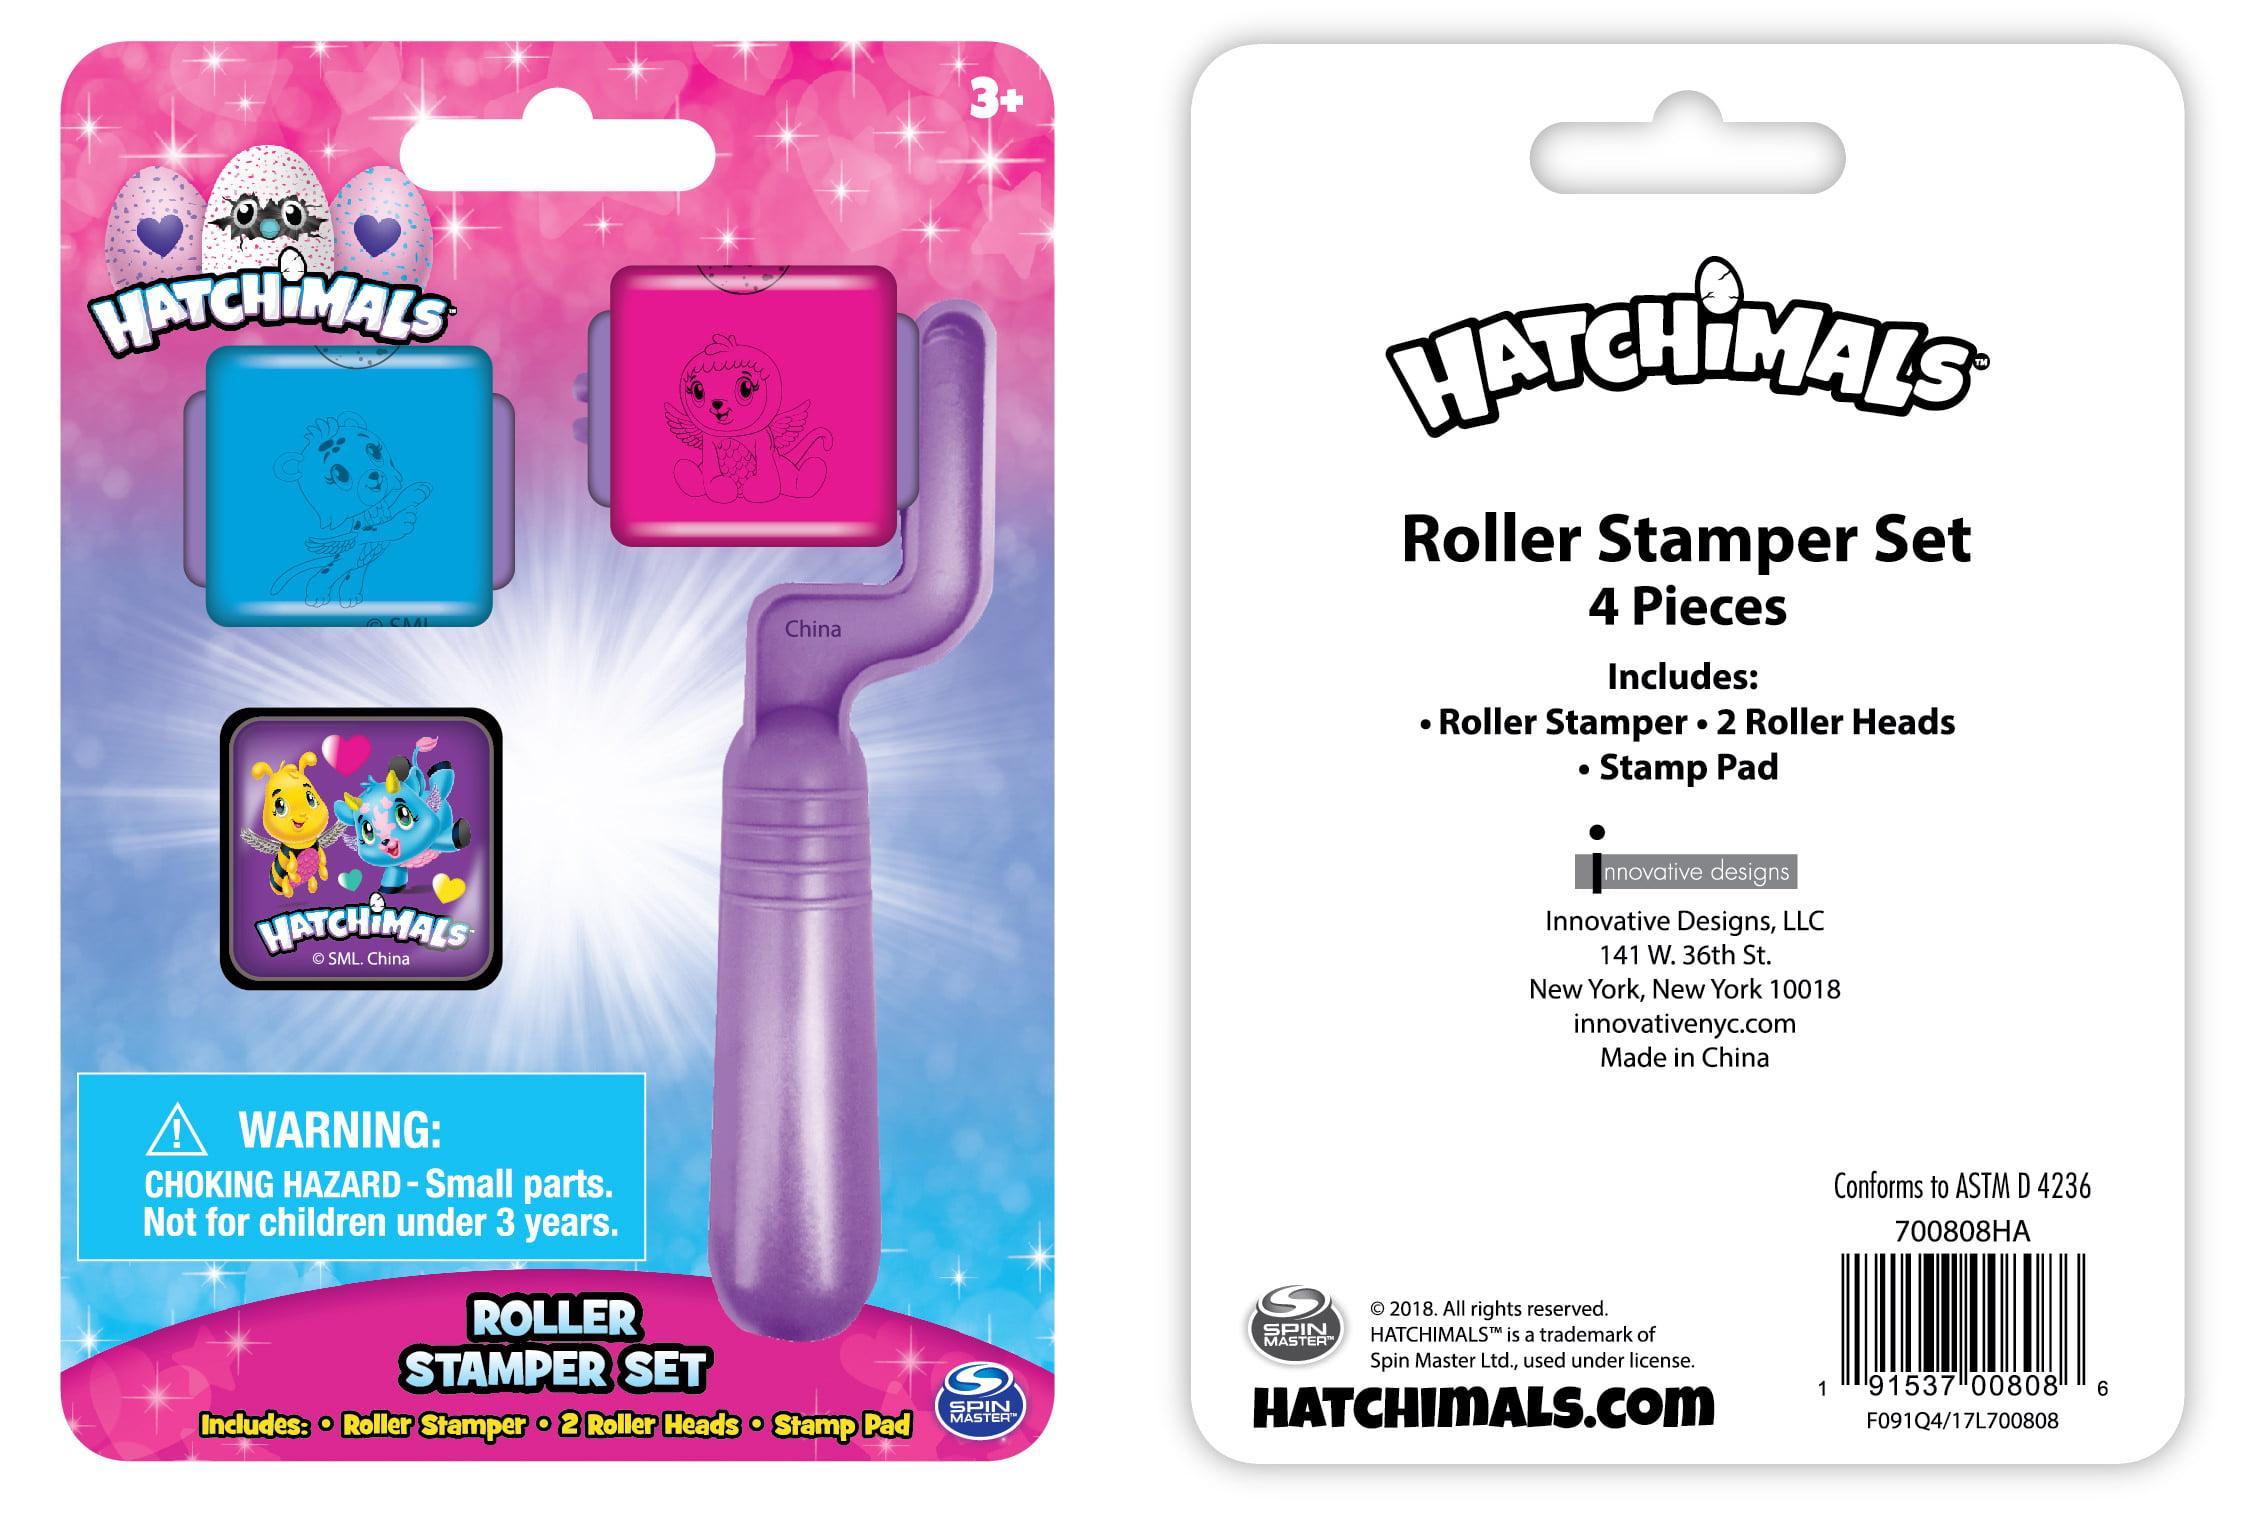 License Hatchimals Roller Stamper - Walmart.com